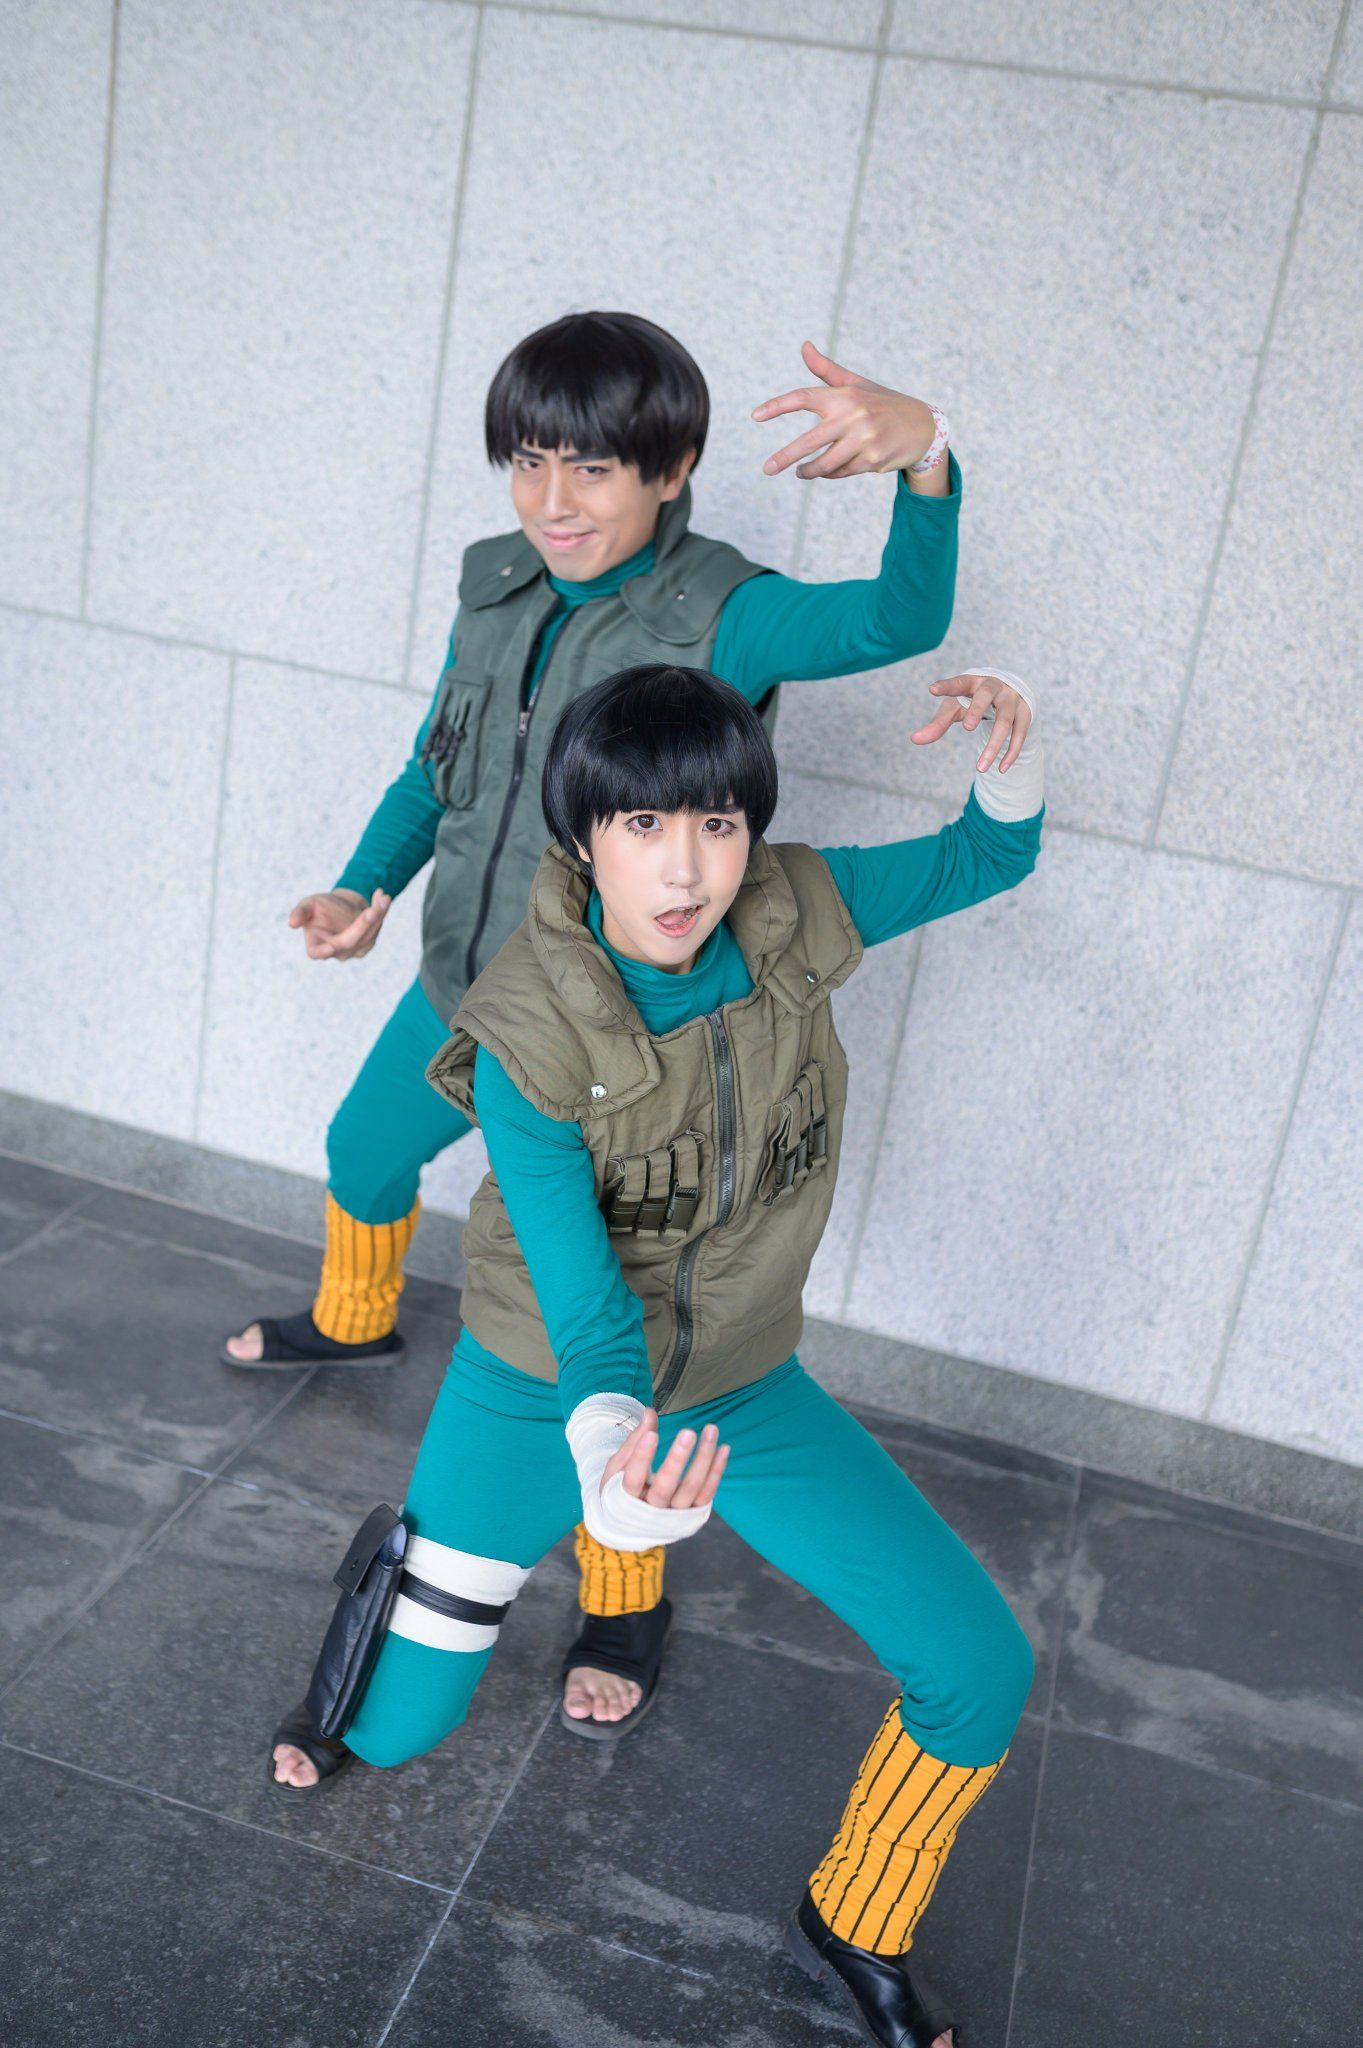 Pin oleh Hahahaha di Naruto shippuden cosplay di 2020